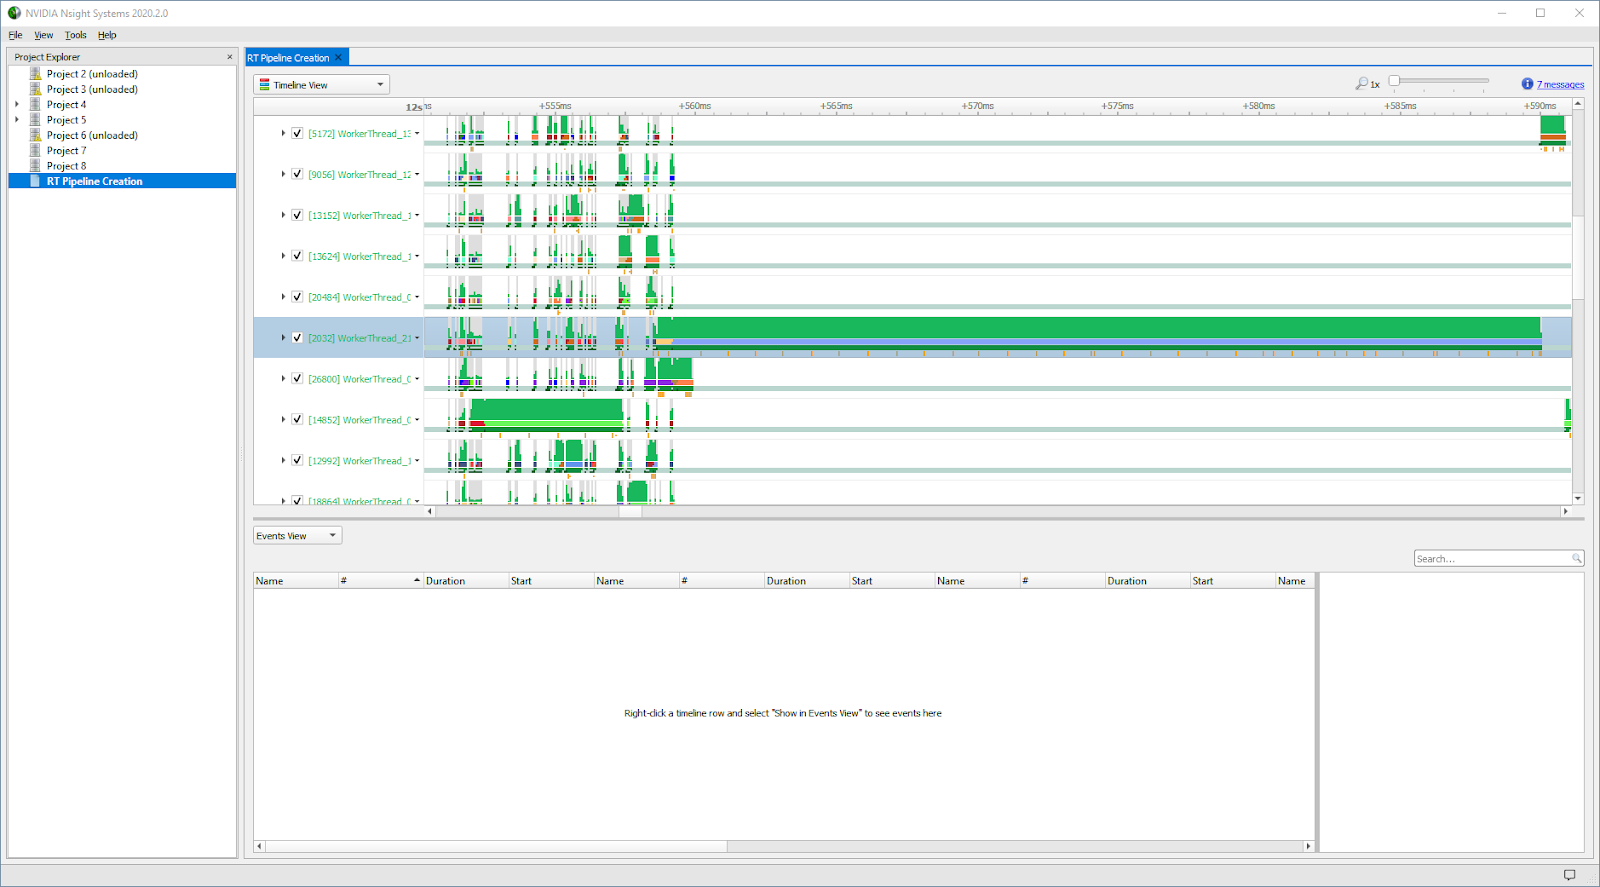 This screenshot shows the long-pole thread.